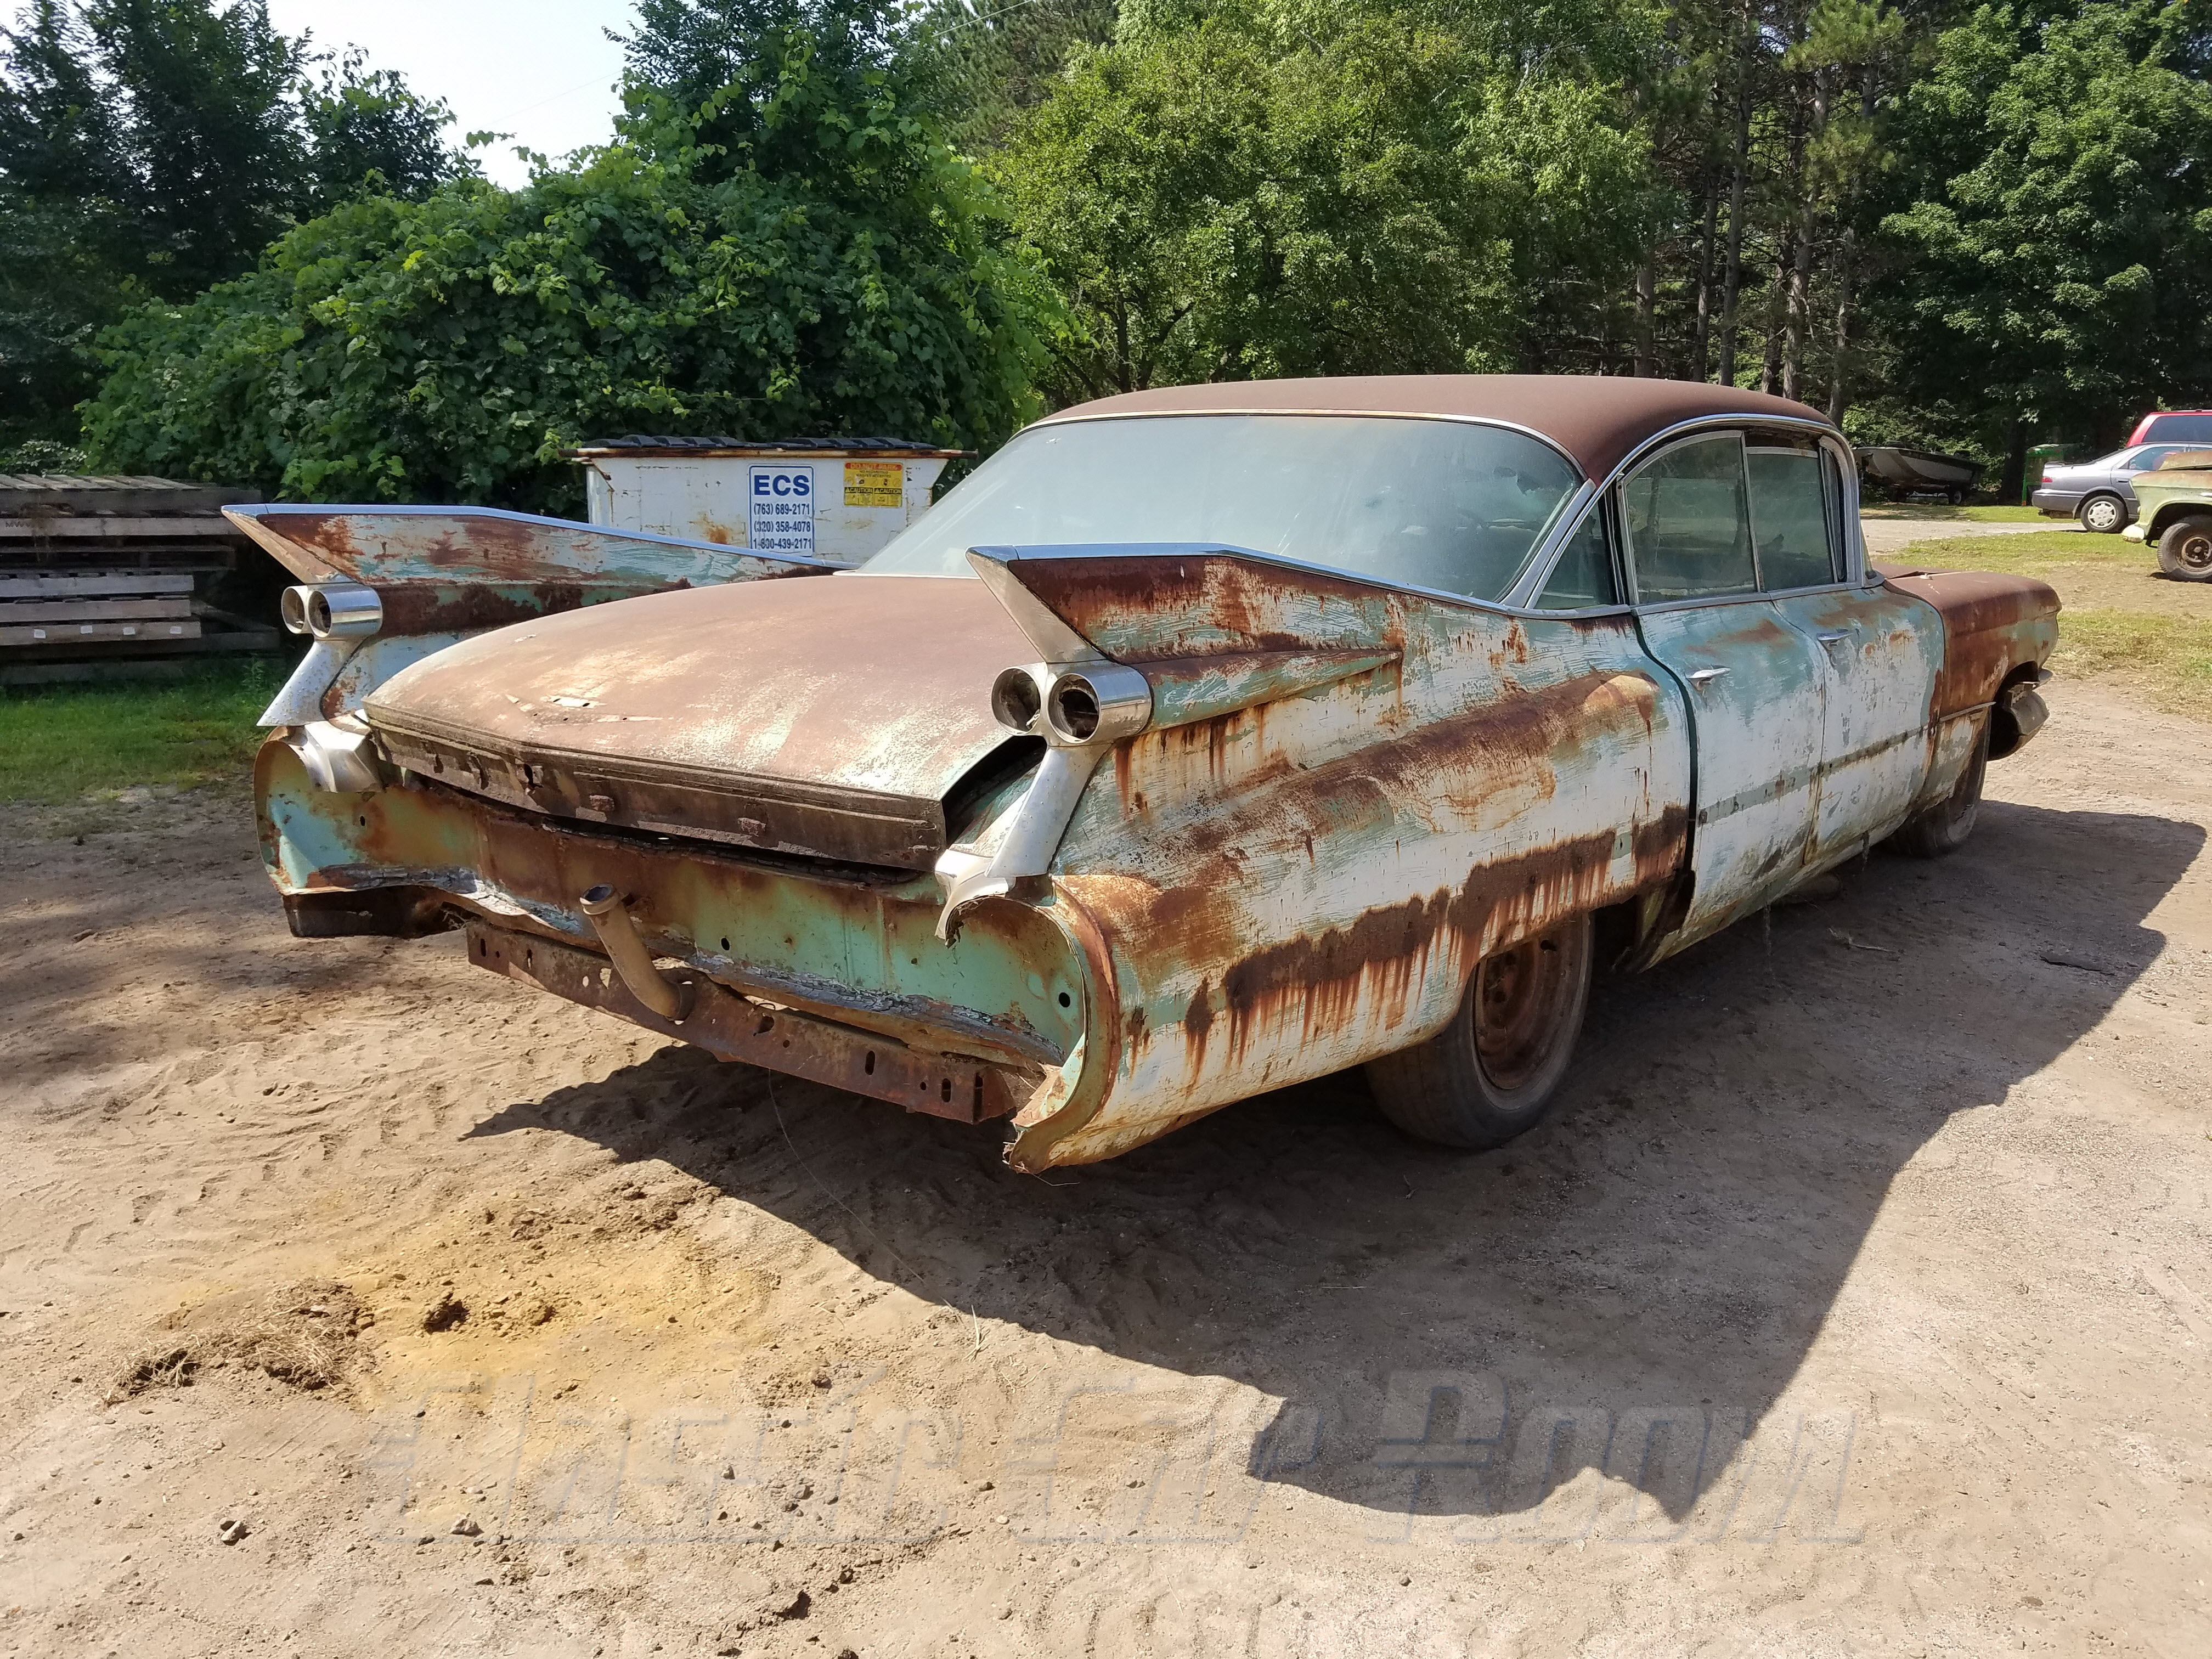 1959 Cadillac Rear (3)